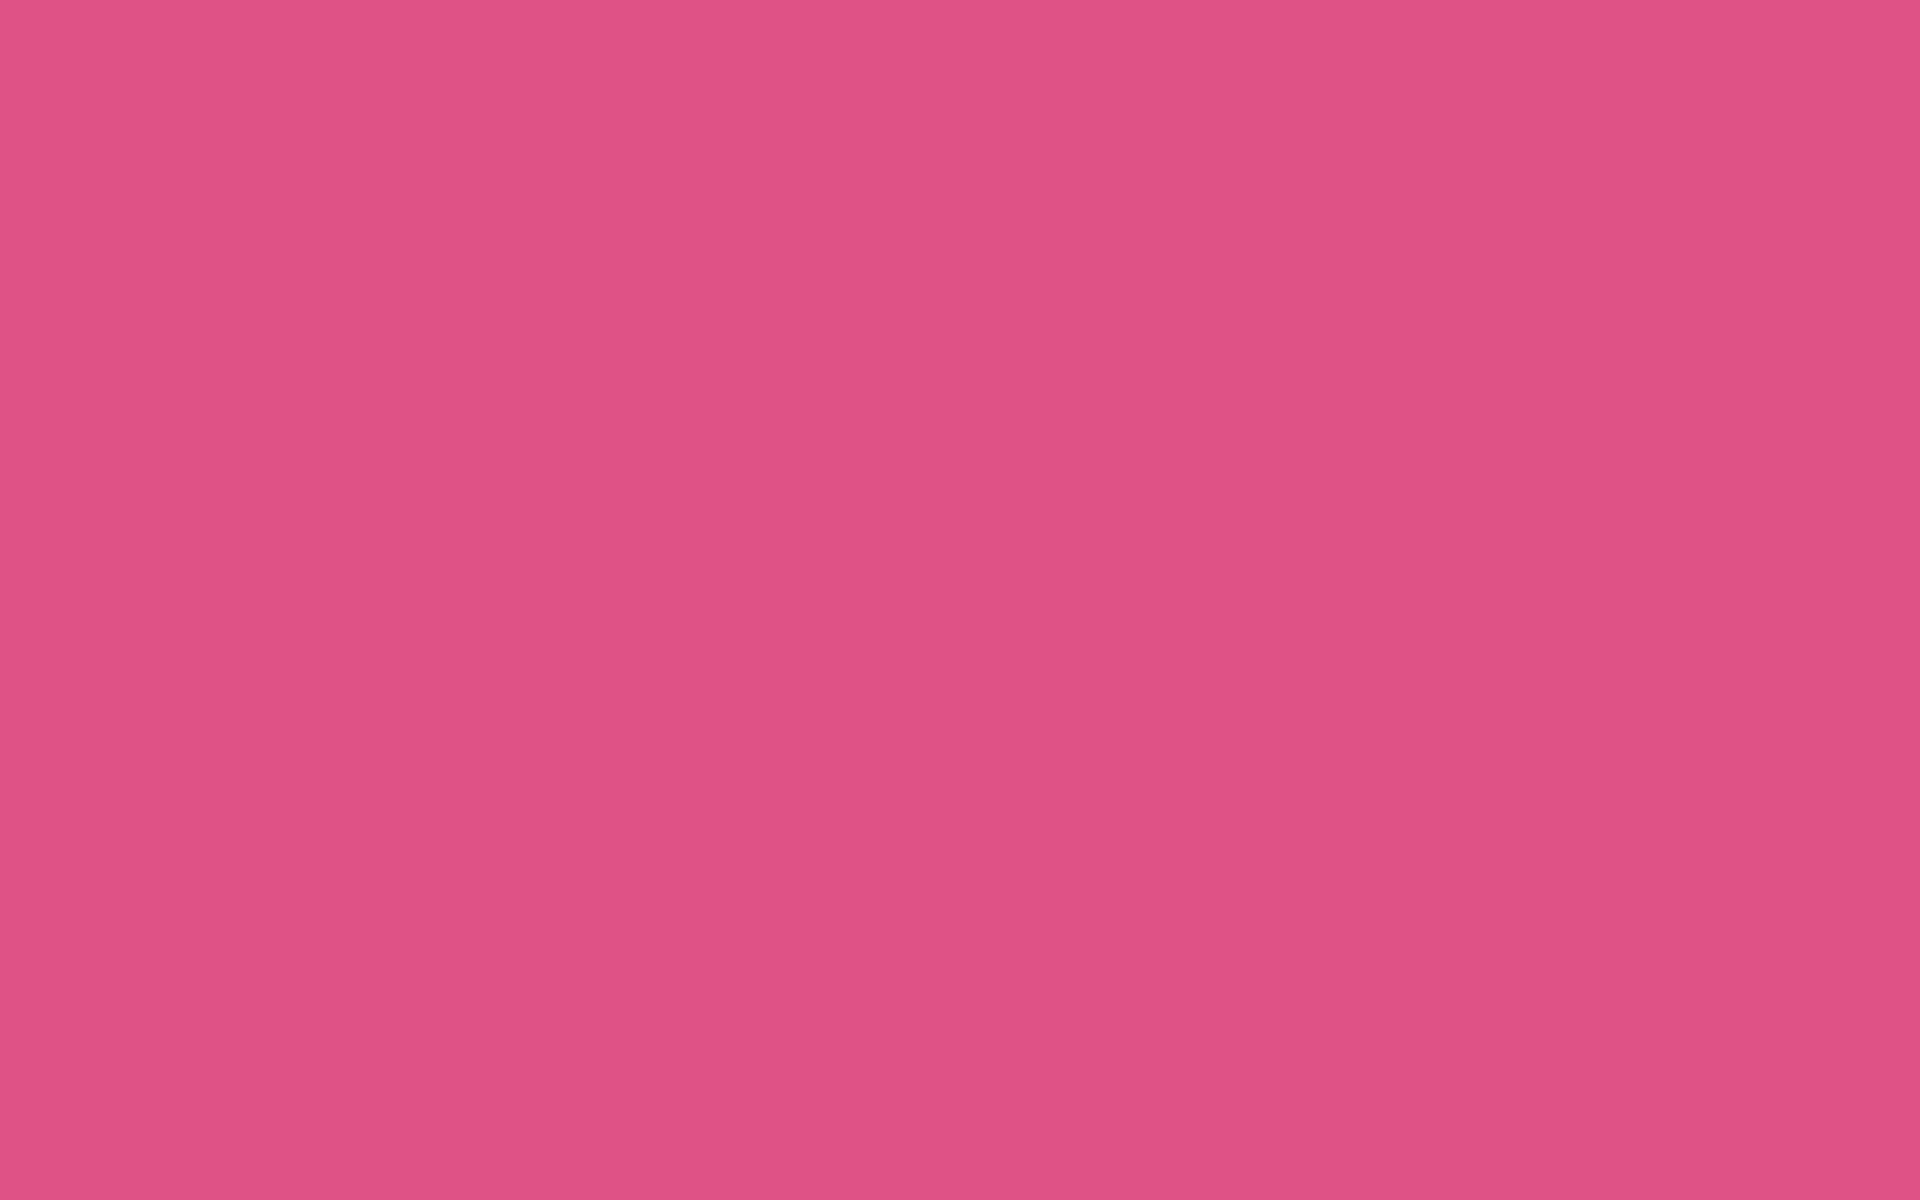 1920x1200 Fandango Pink Solid Color Background